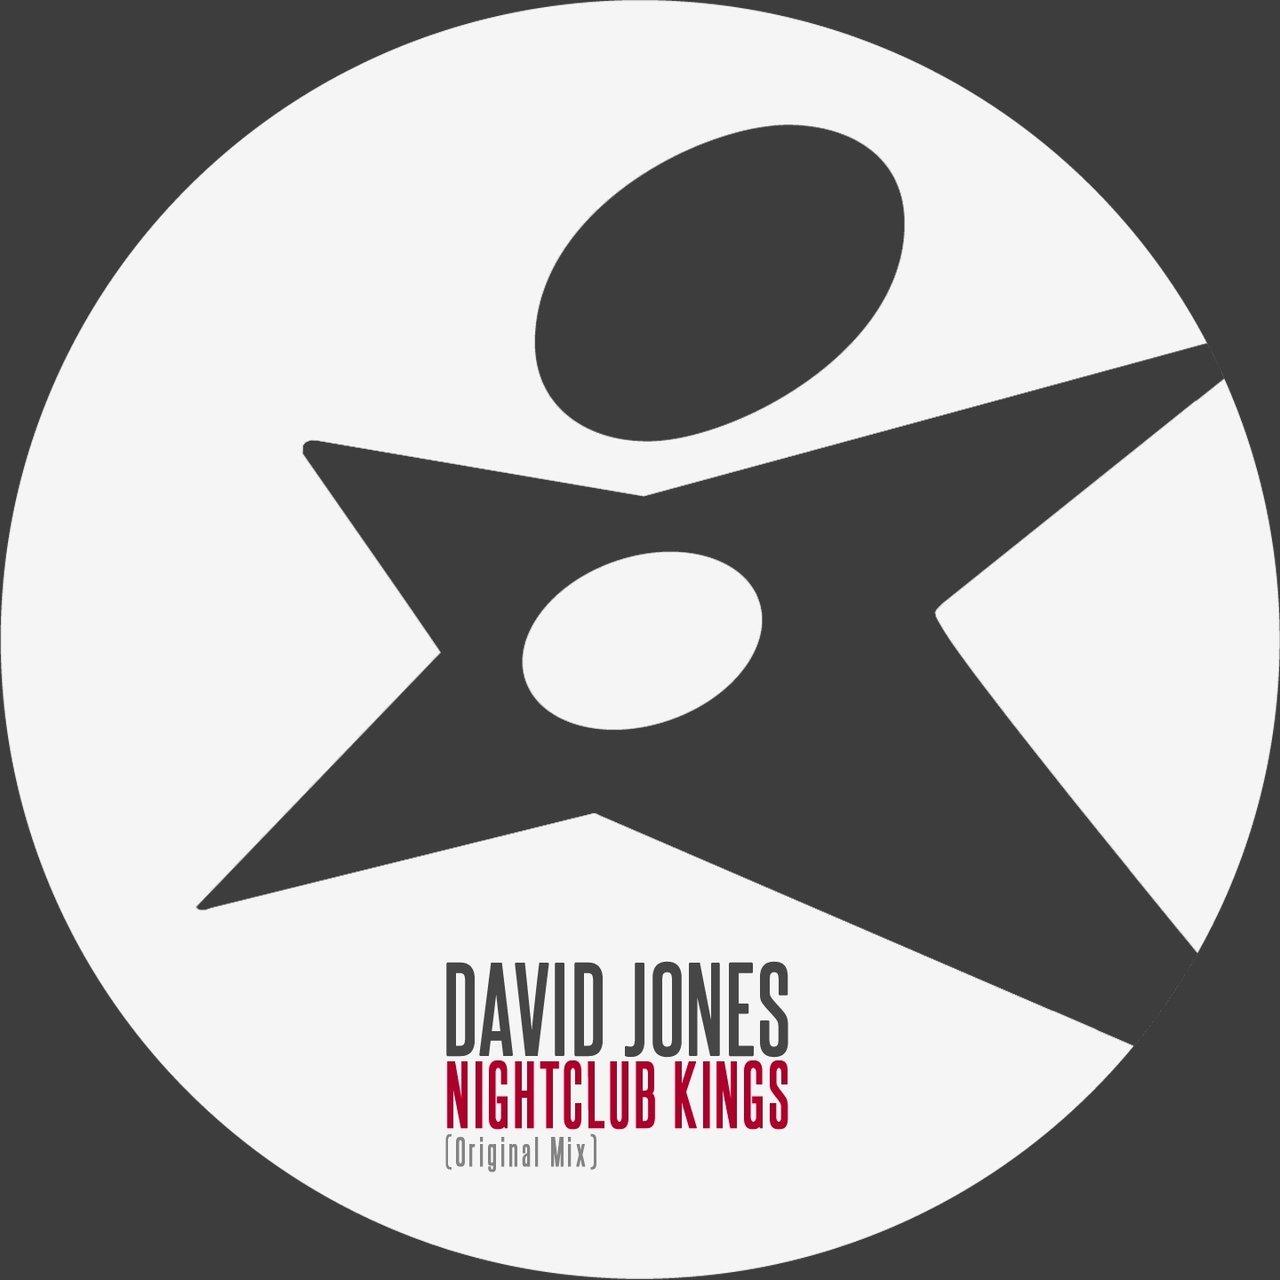 Tidal listen to david jones on tidal david jones nightclub kings buycottarizona Image collections